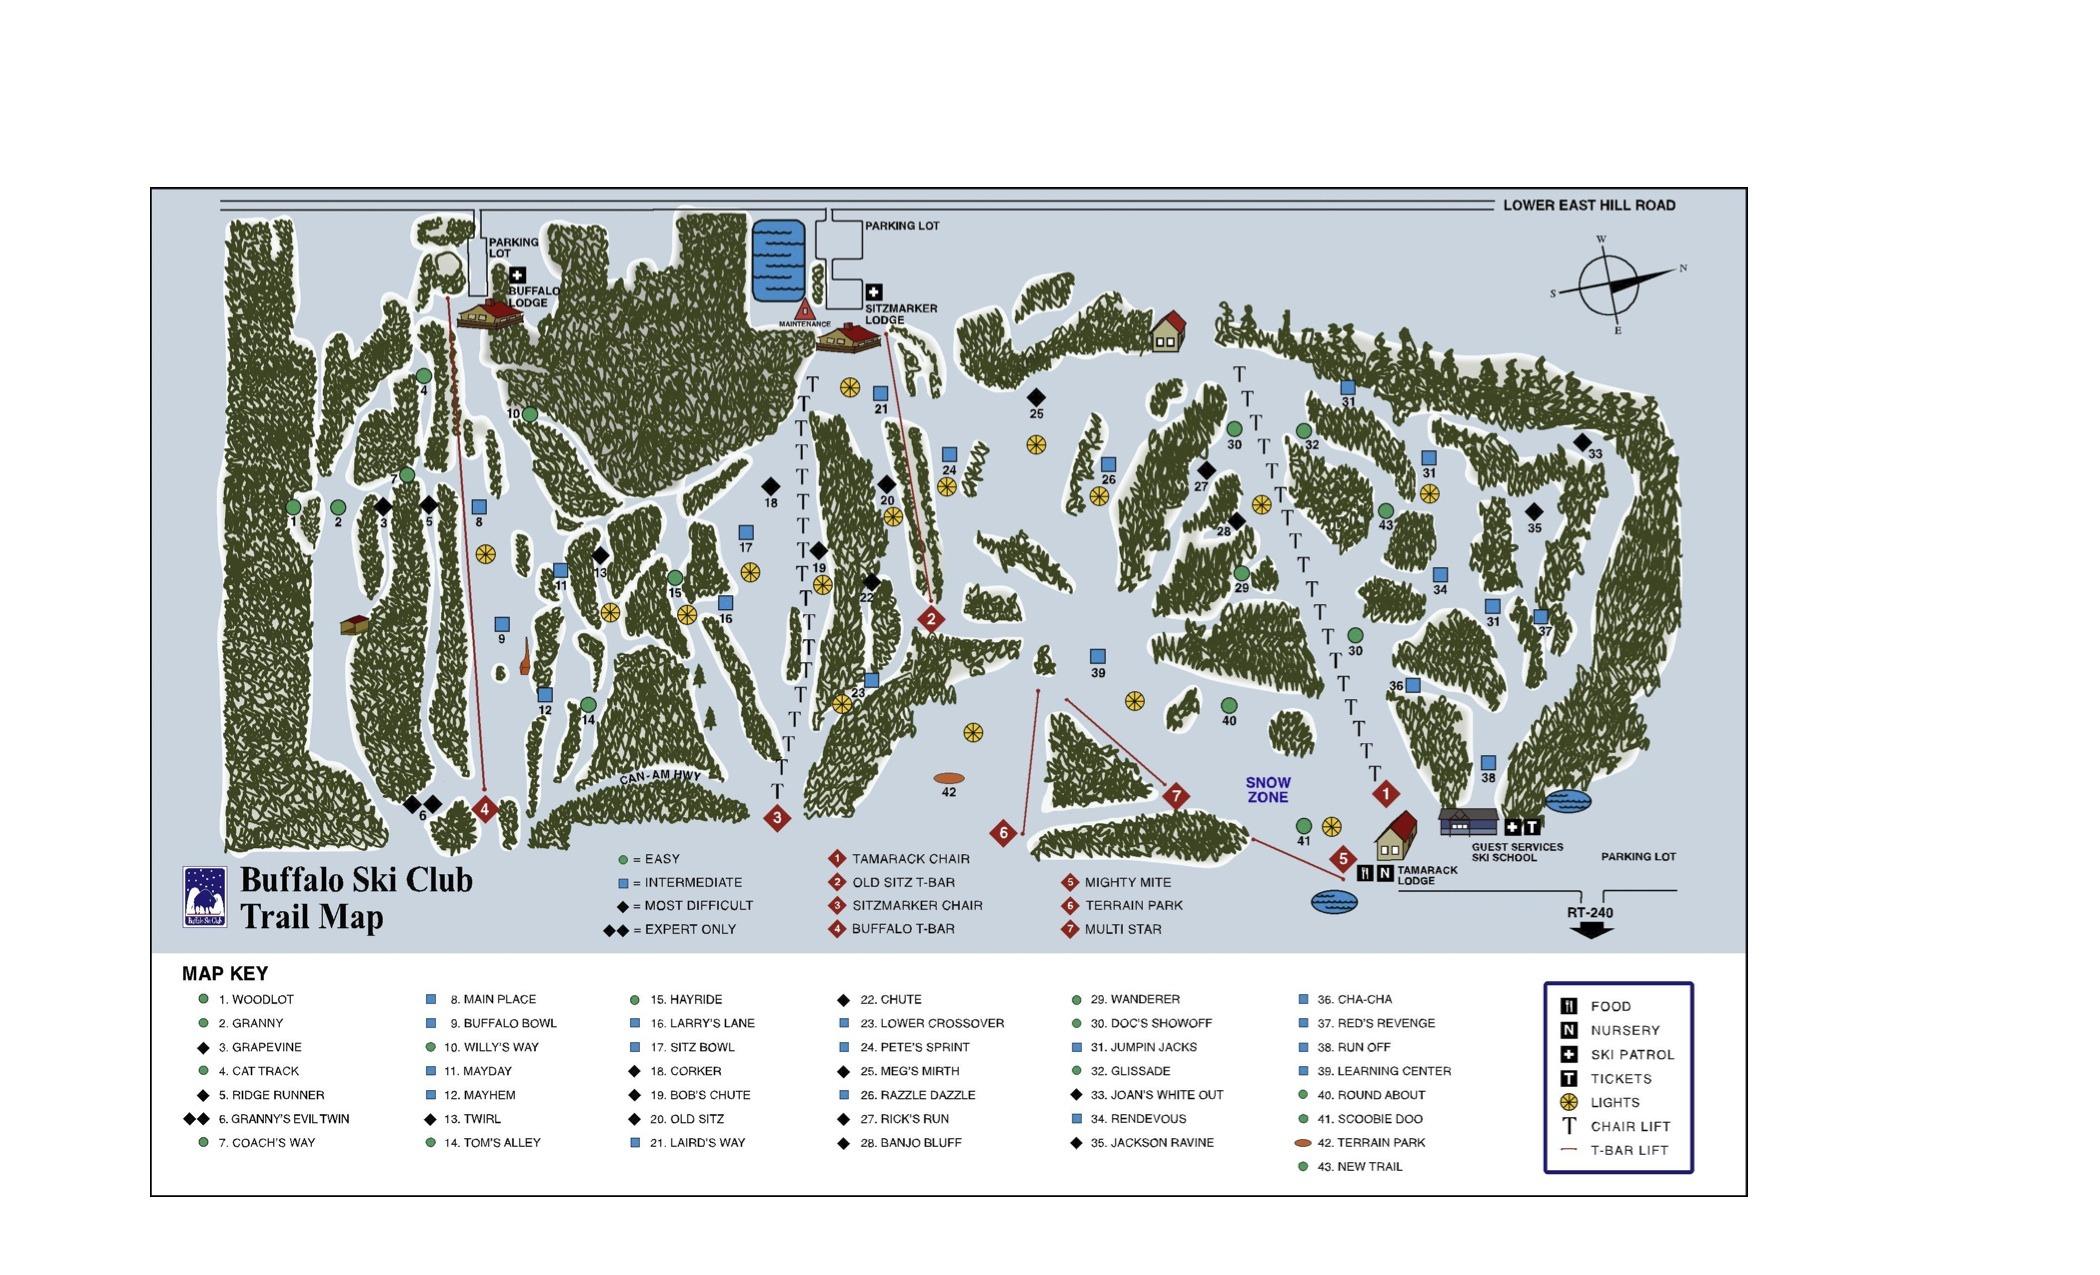 Buffalo Ski Club Ski Area Trail Map OnTheSnow